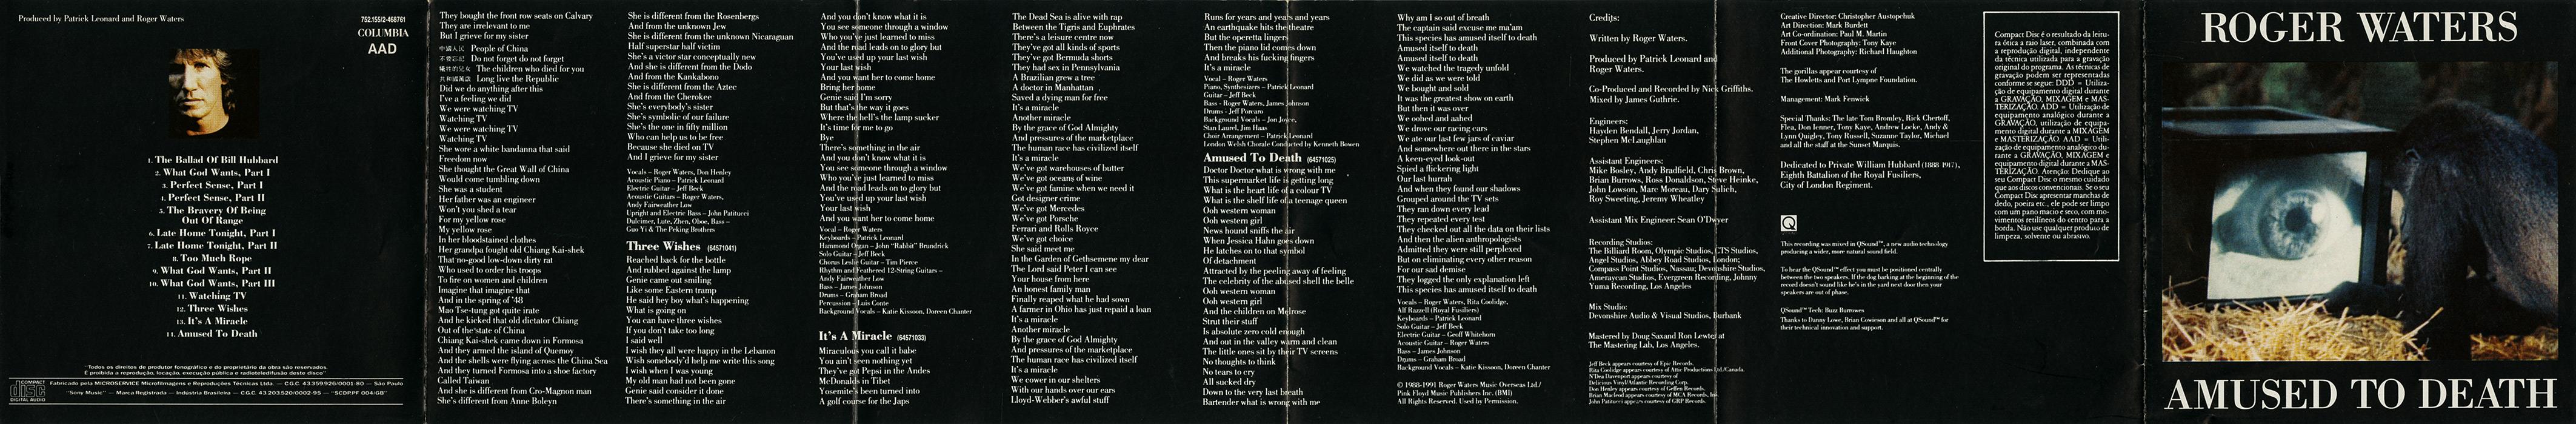 Archive - Fold lyrics